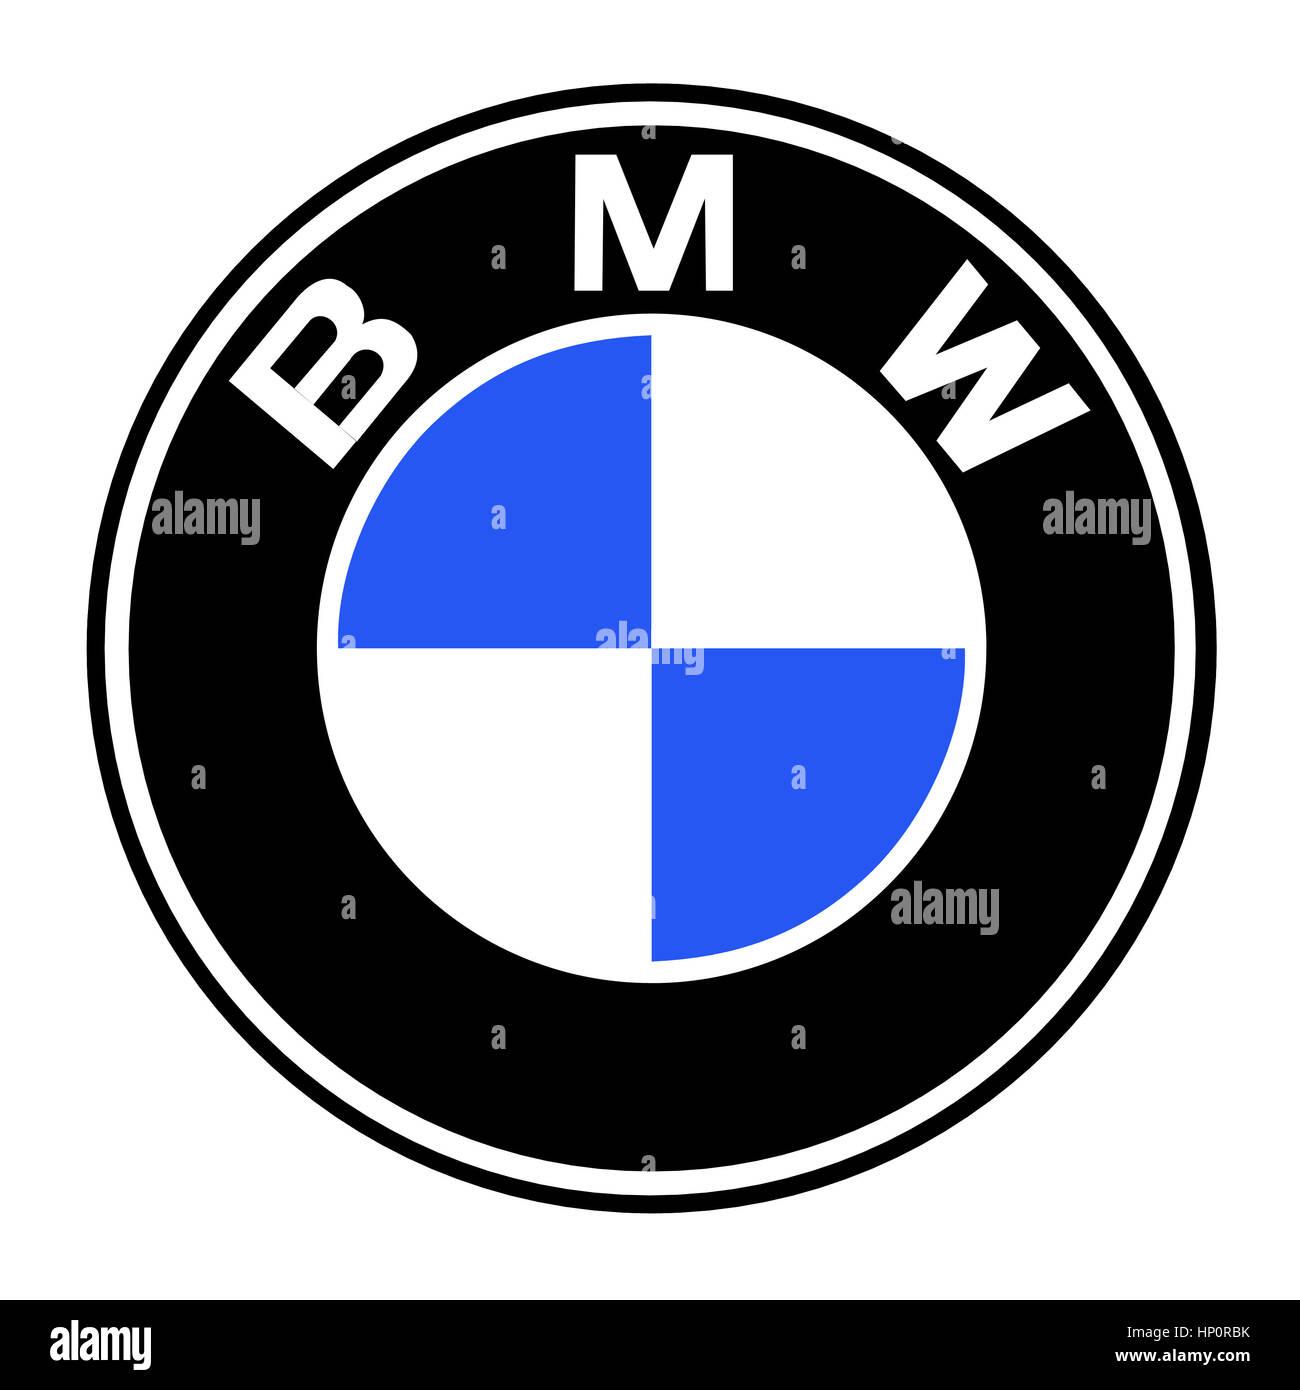 BMW Logo - Stock Image